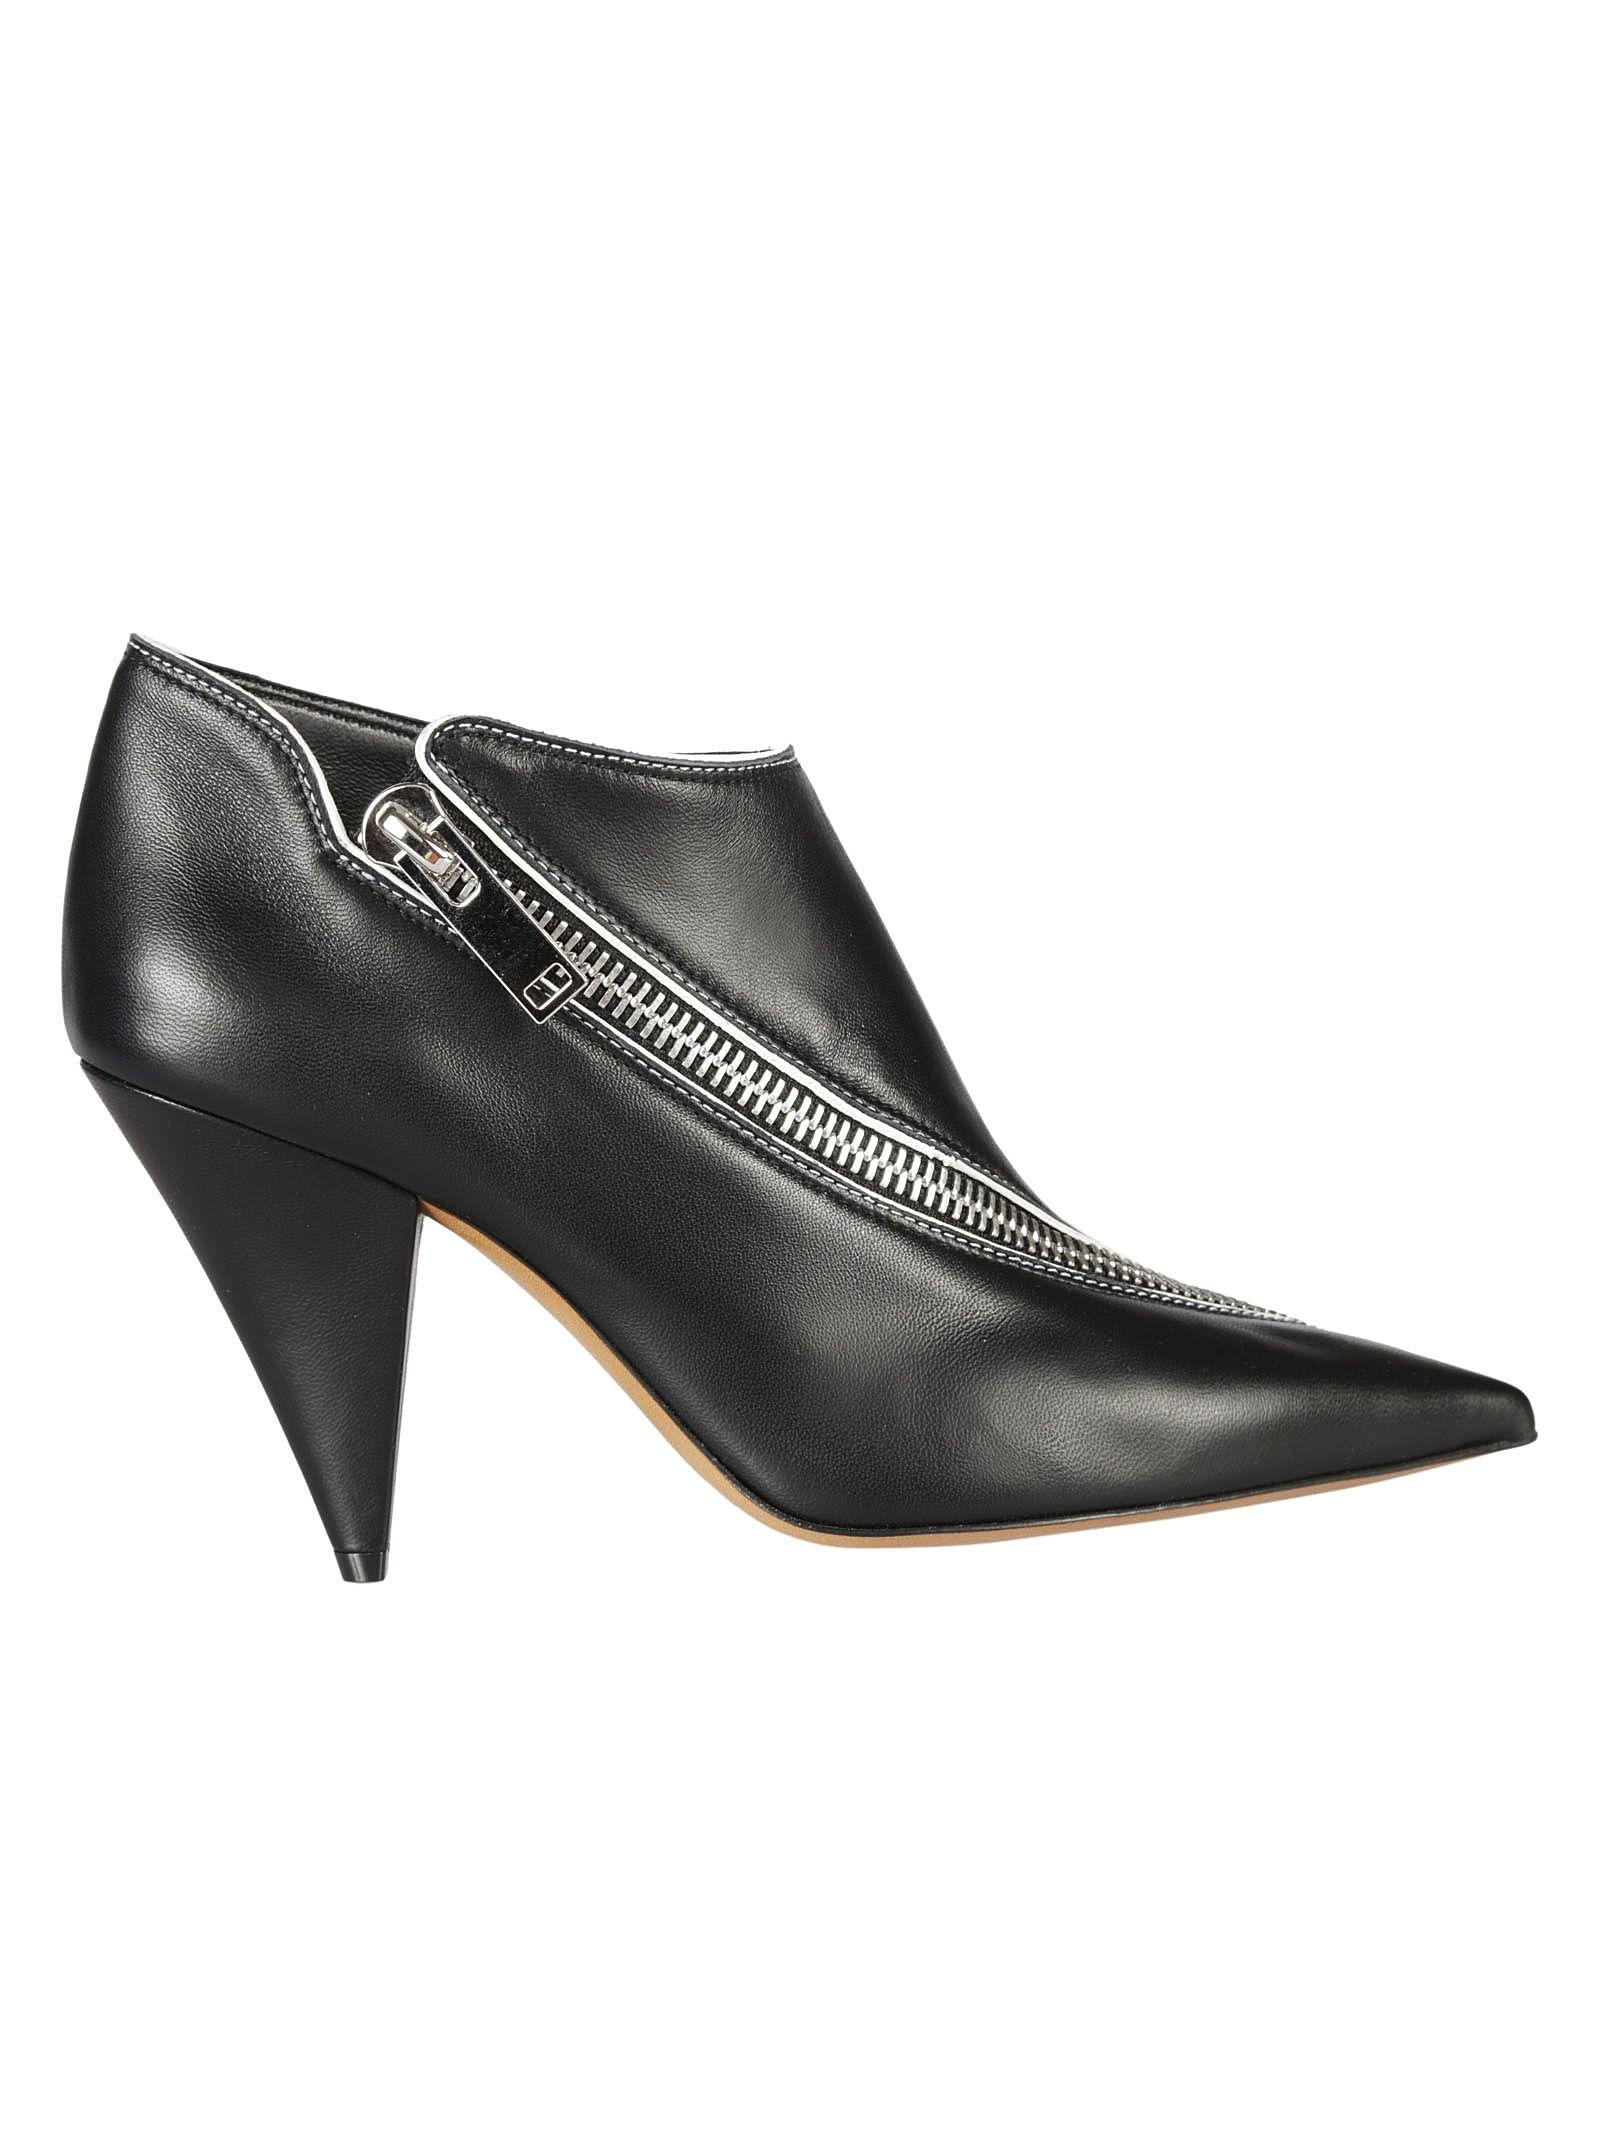 Celine - Celine Zipped Ankle Boots